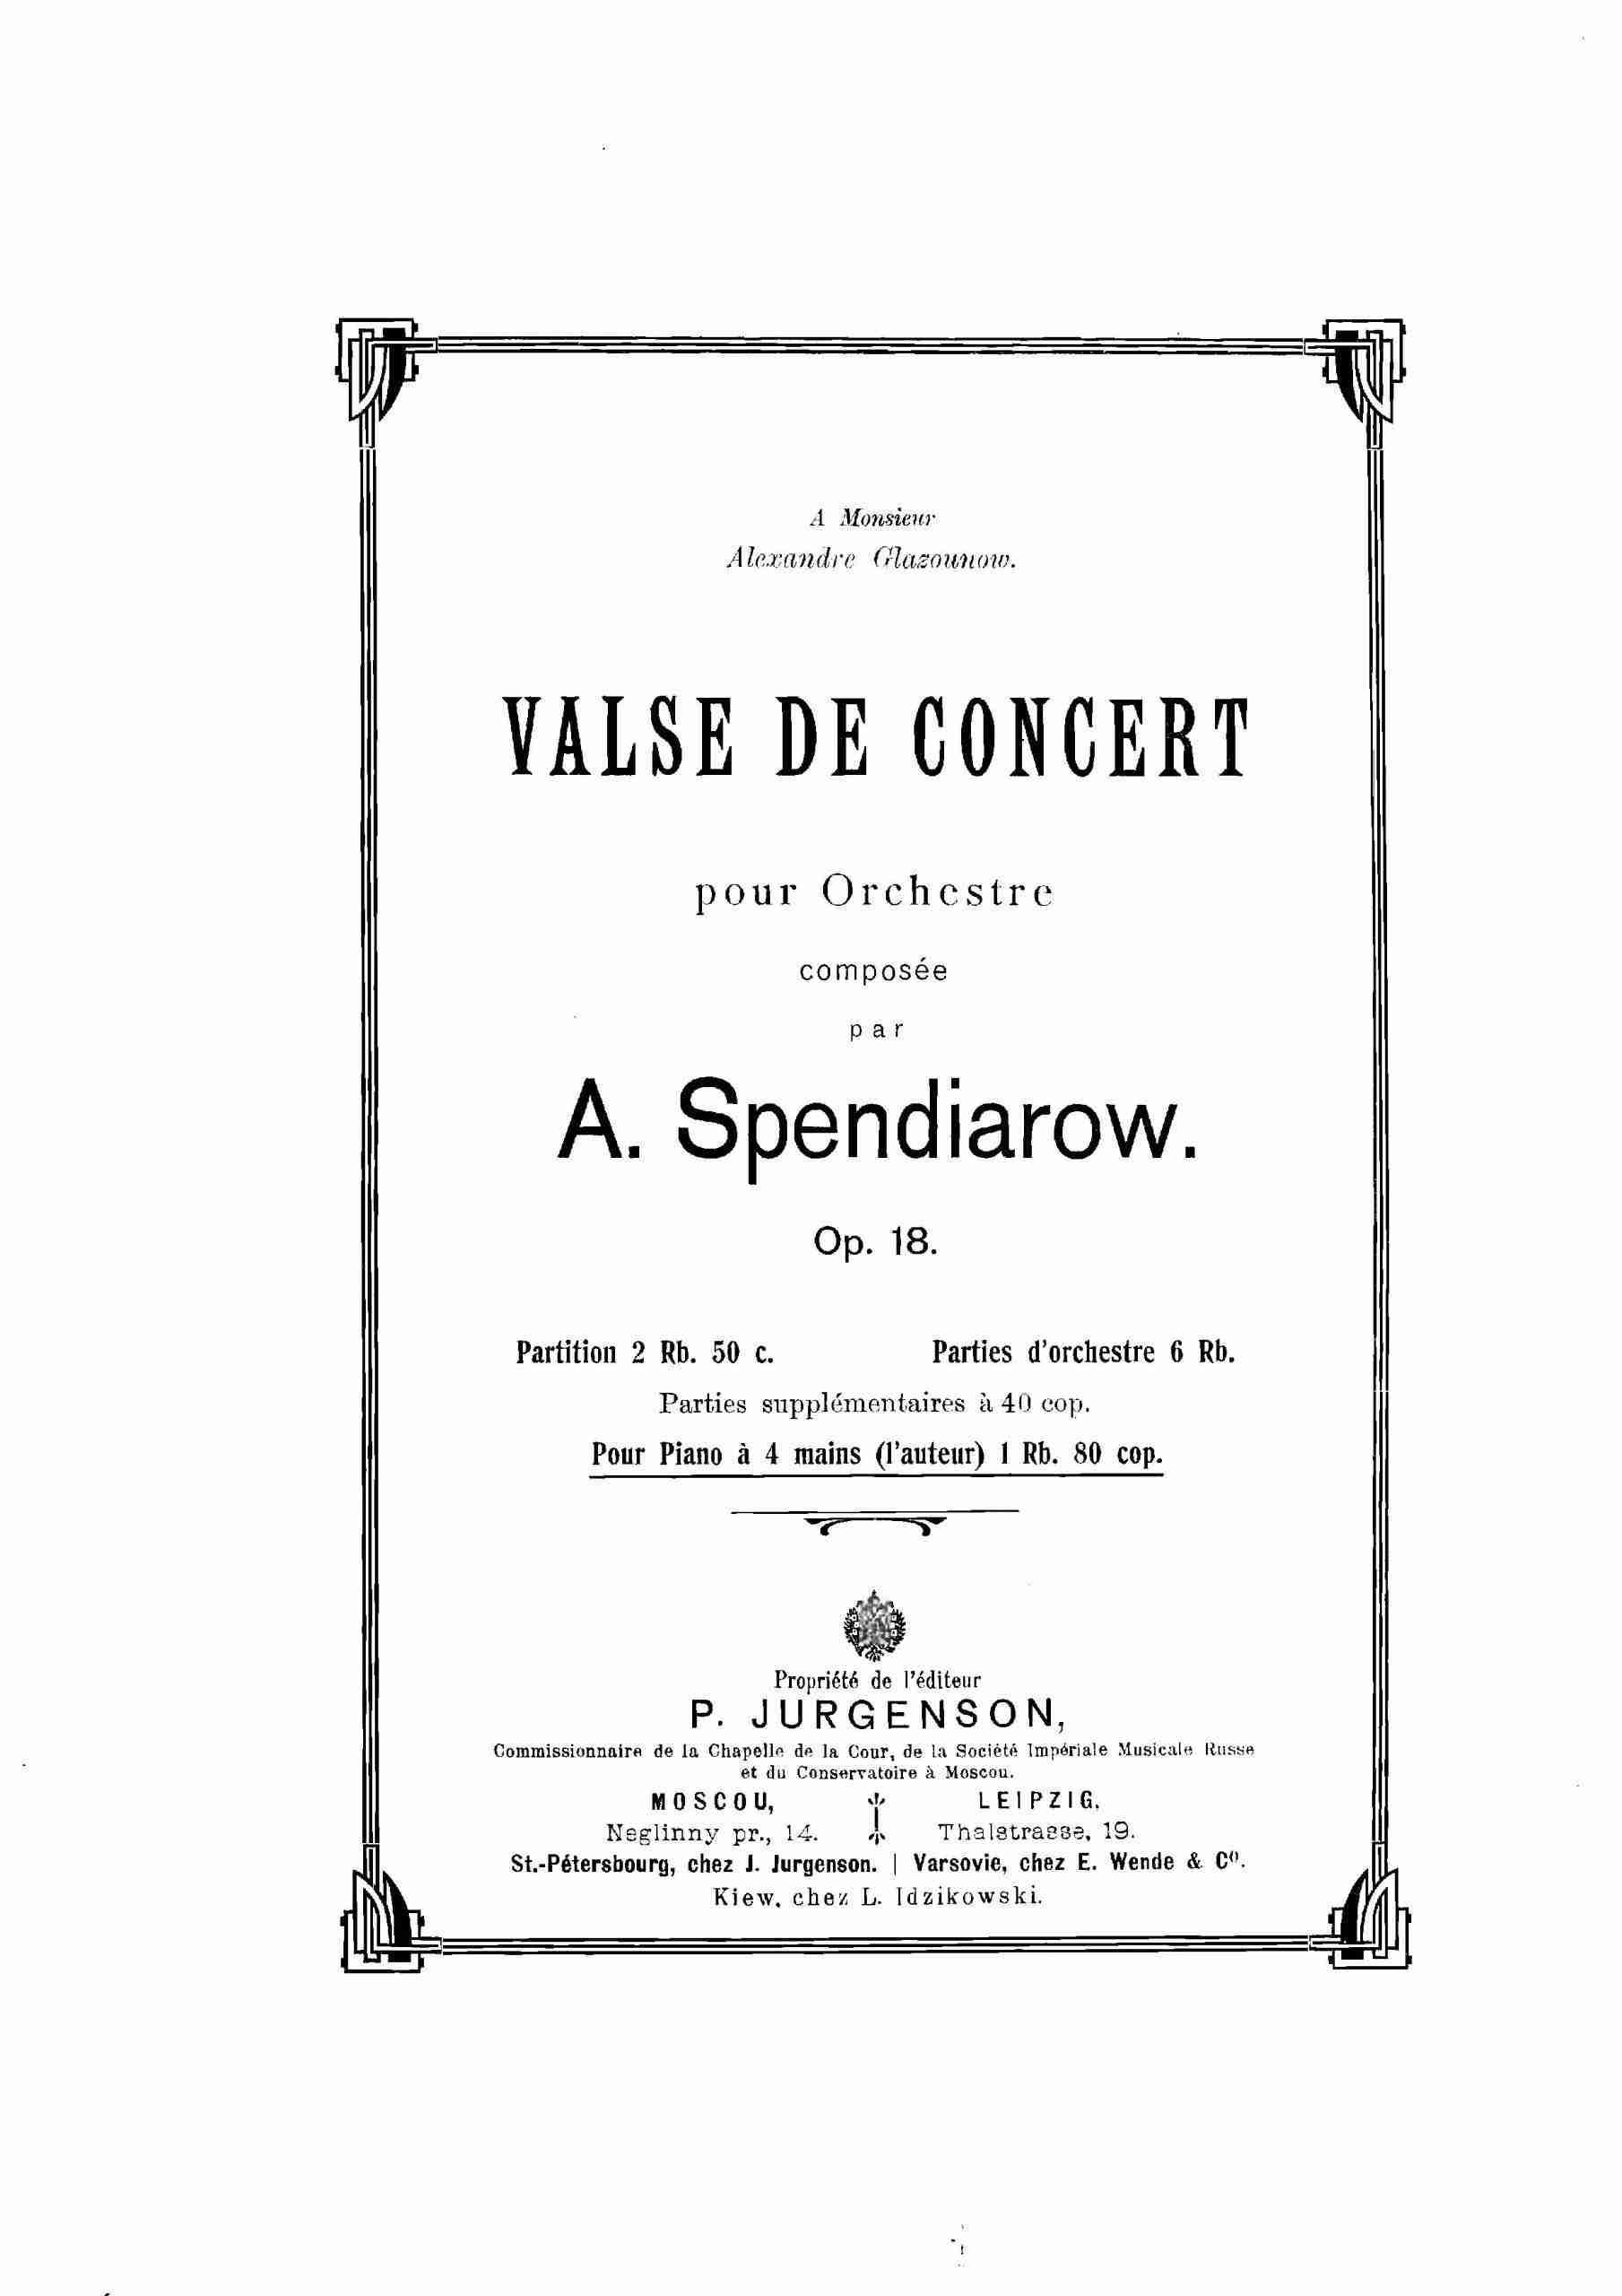 Spendiarov, Aleksandr - Concert Waltz, Op.18